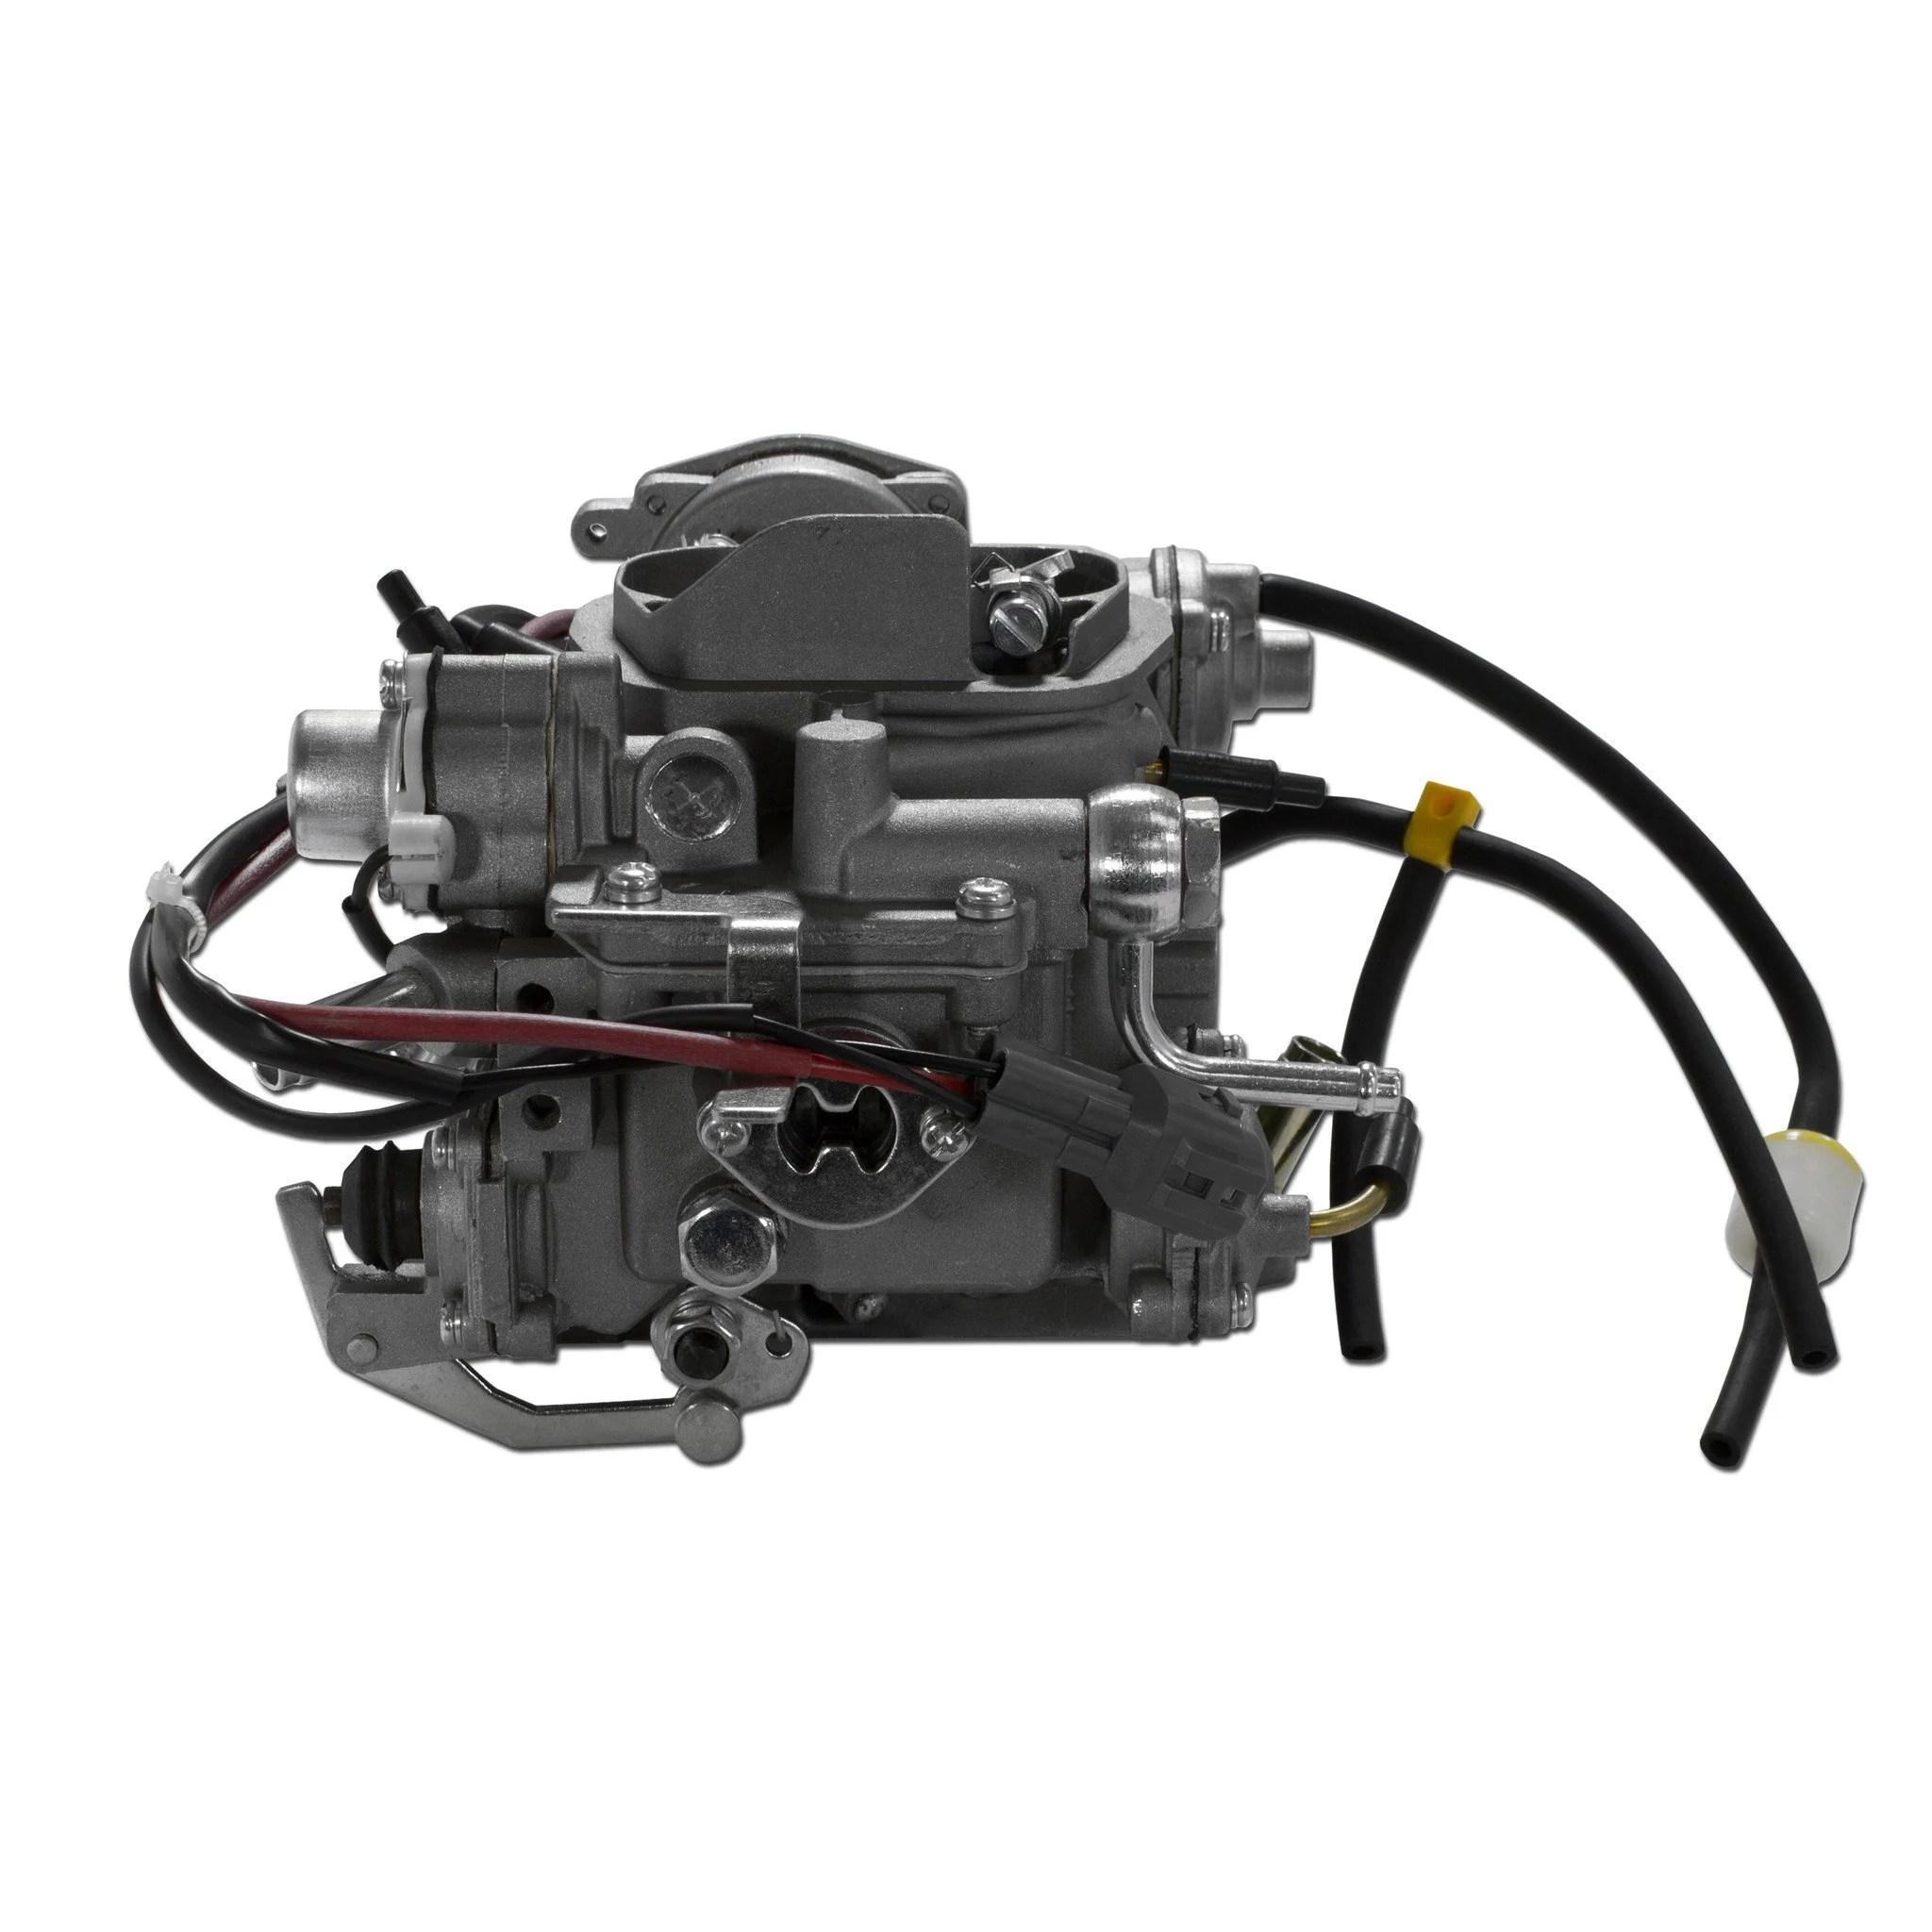 medium resolution of  toyota 22r carburetor carb electric choke model 1 21100 35463c